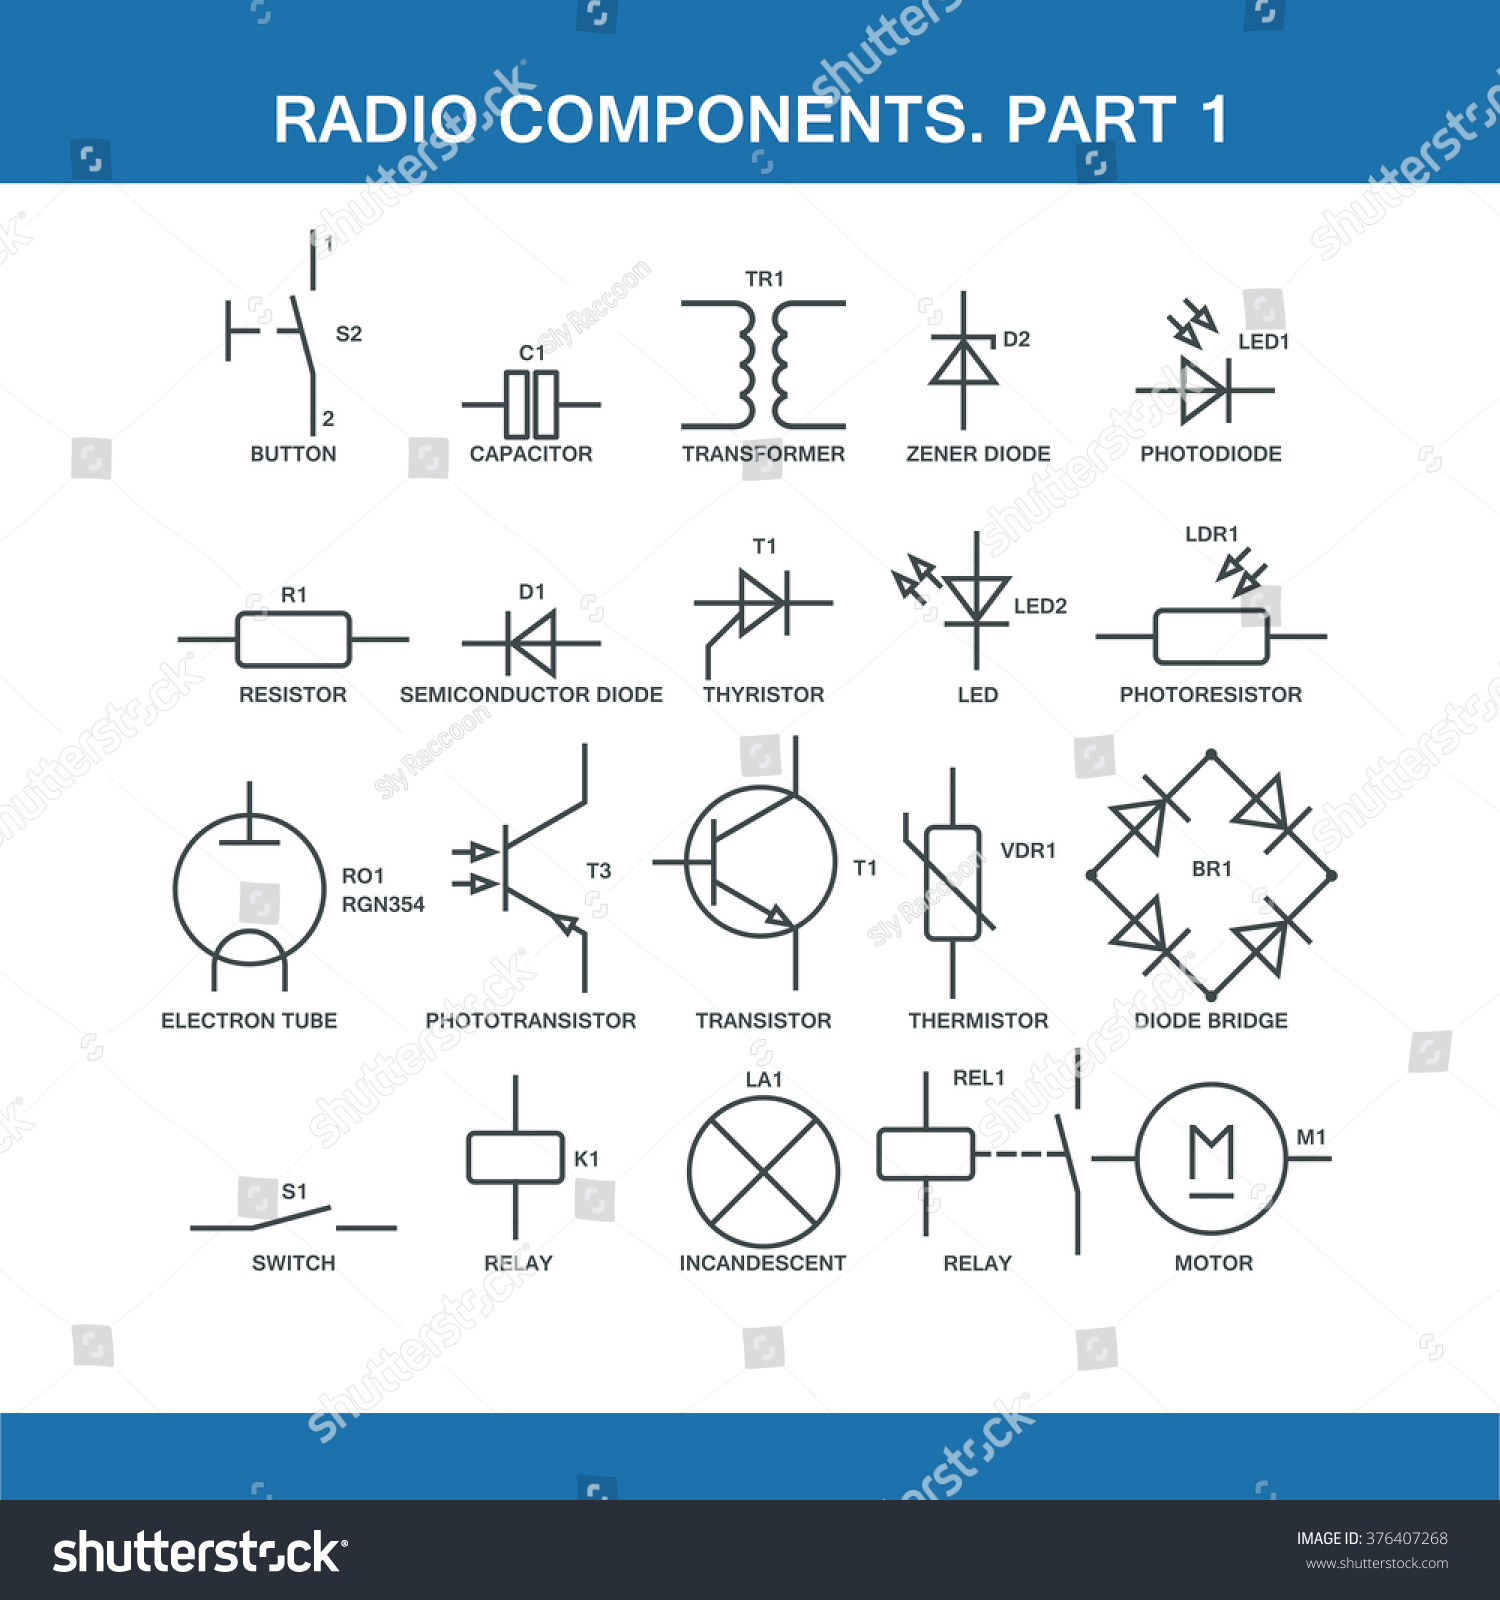 hight resolution of dodge 48re transmission wiring diagram 2001 dodge ram 2500 47re transmission problems 47re transmission diagram 4x4